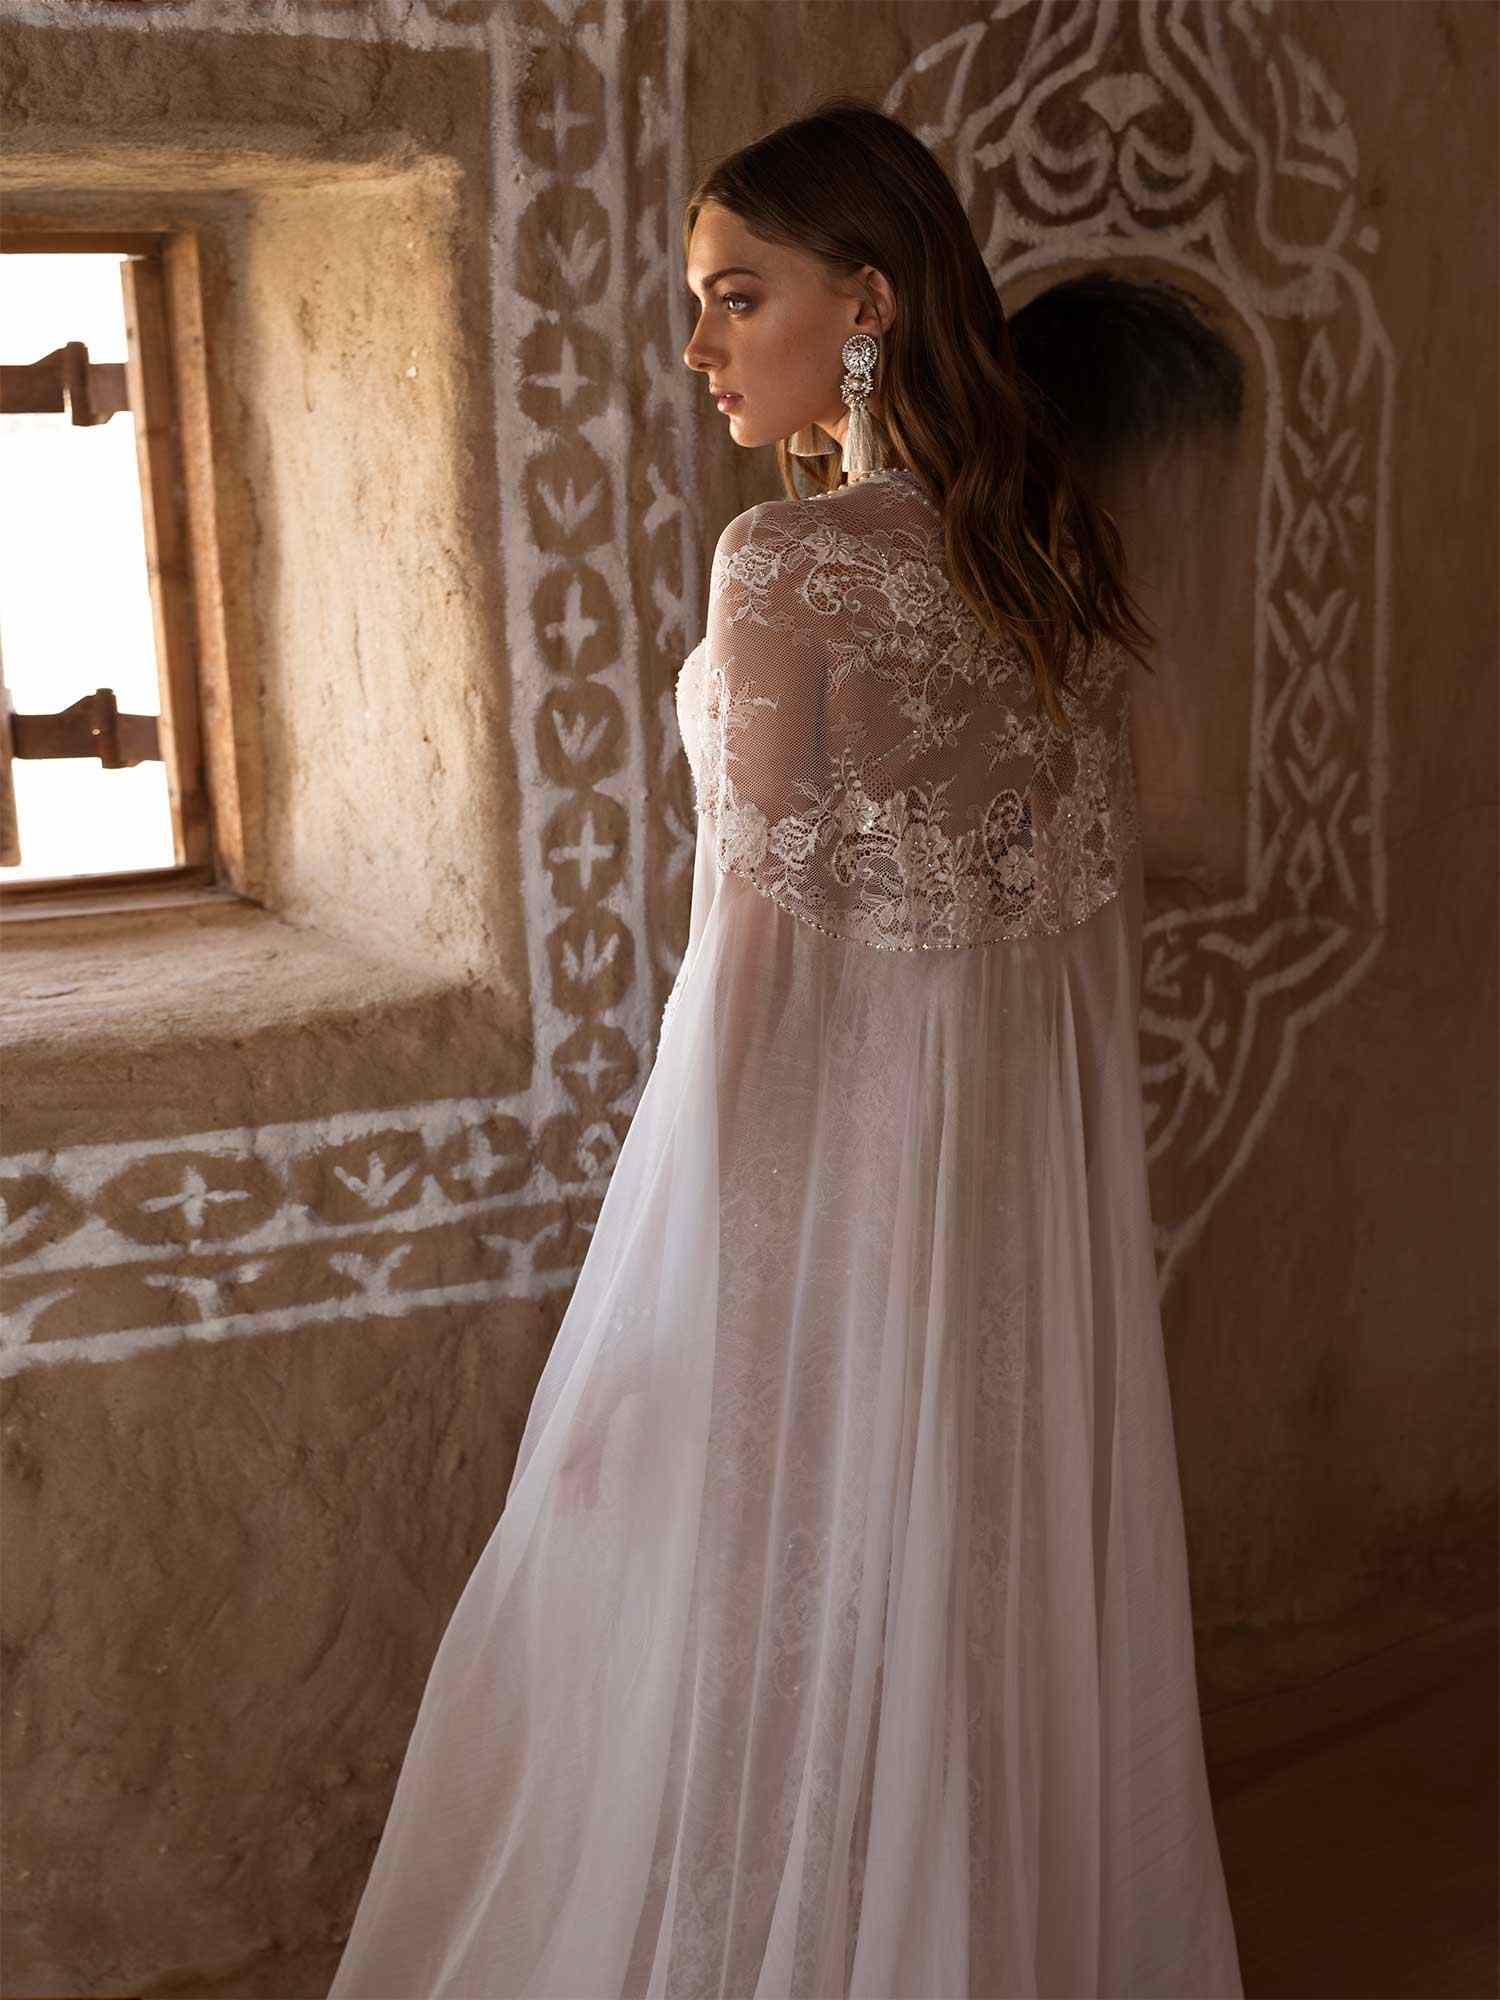 2019 Bohemian Wedding Dresses With Wraps Spaghetti Straps Lace Sequins Bridal Gowns Beach Mermaid Wedding Dress Robe De Mariee